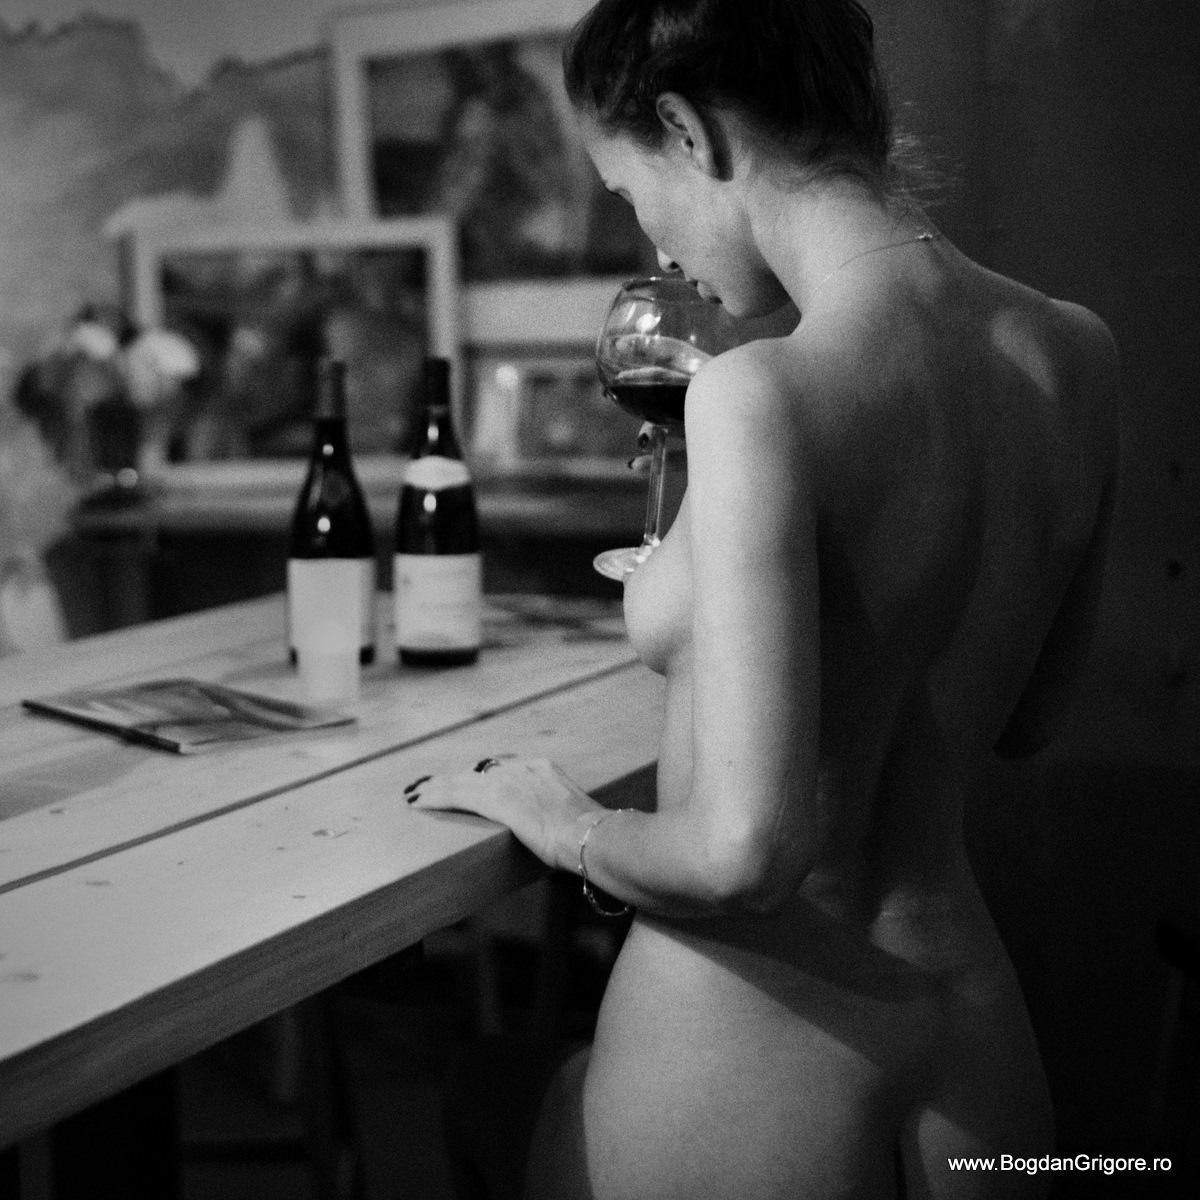 Bogdan Grigore - Wine lover 2